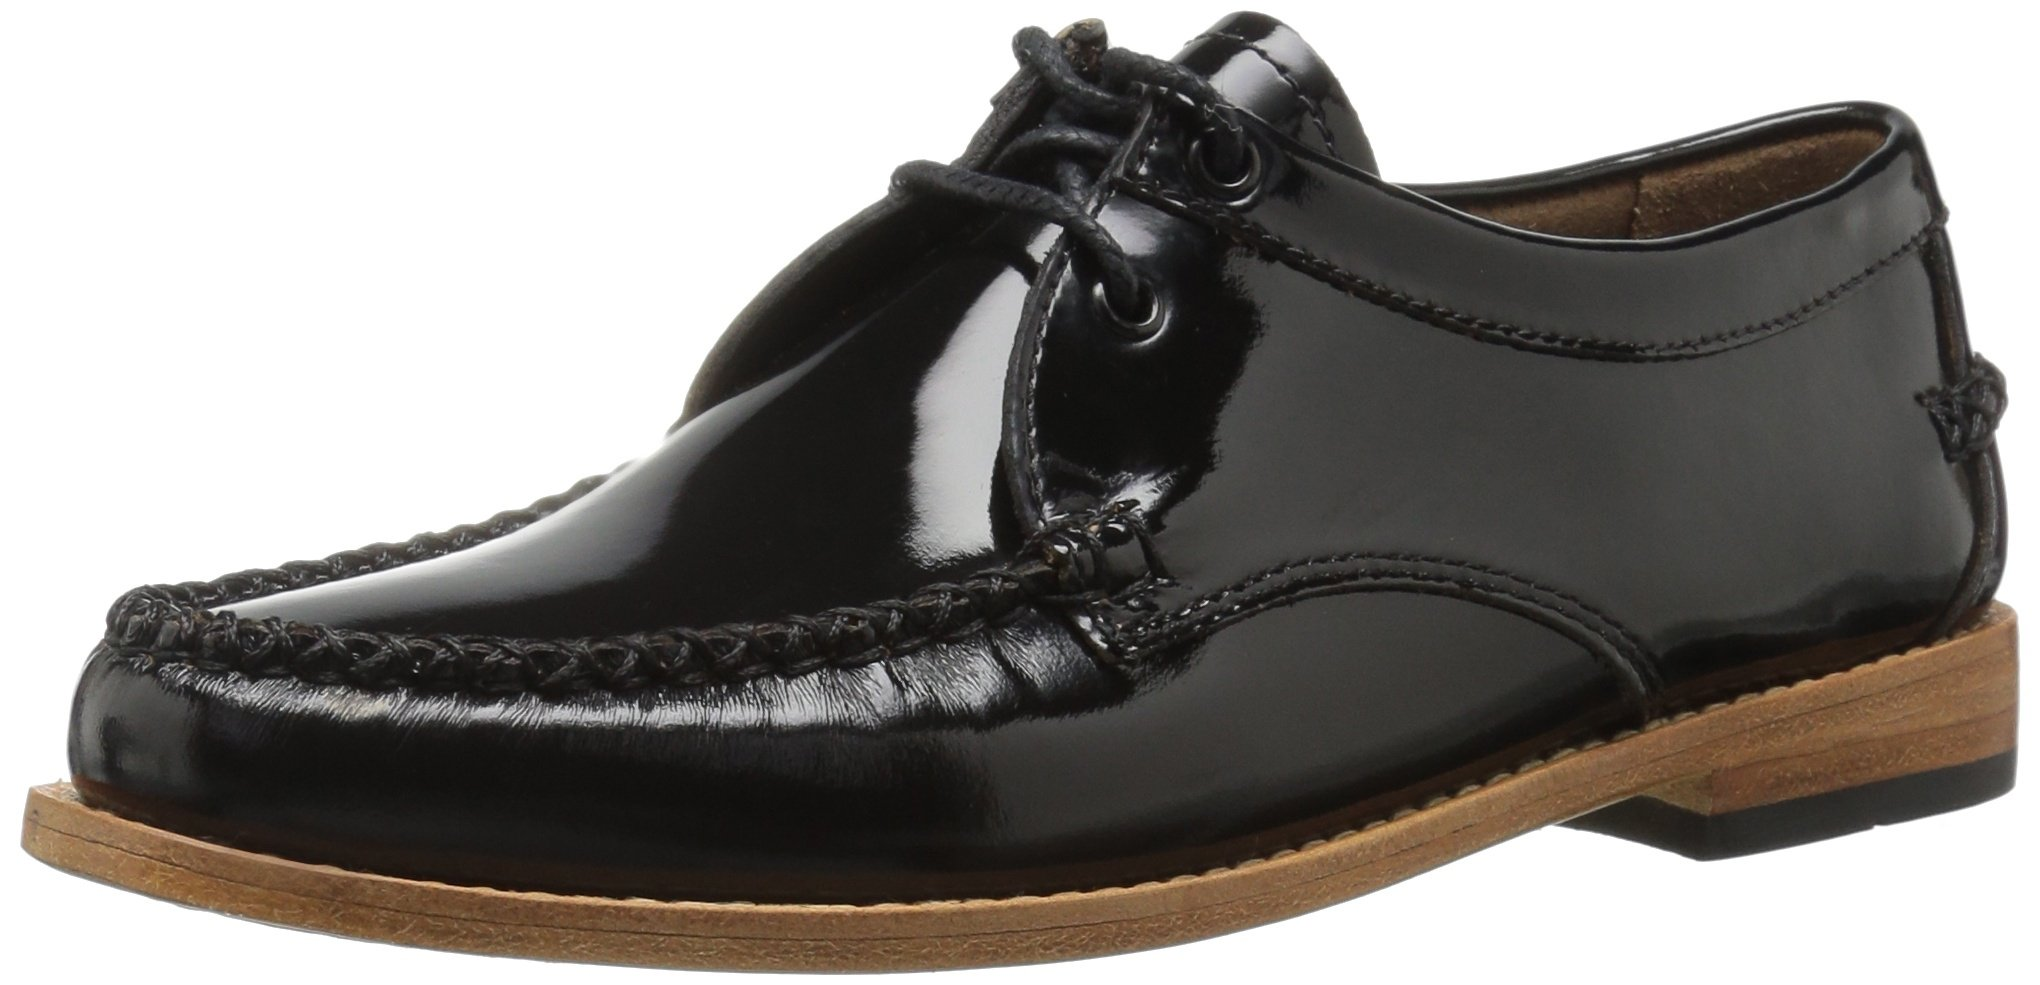 G.H. Bass & Co. Women's Winnie Tuxedo Loafer, Black, 8.5 M US